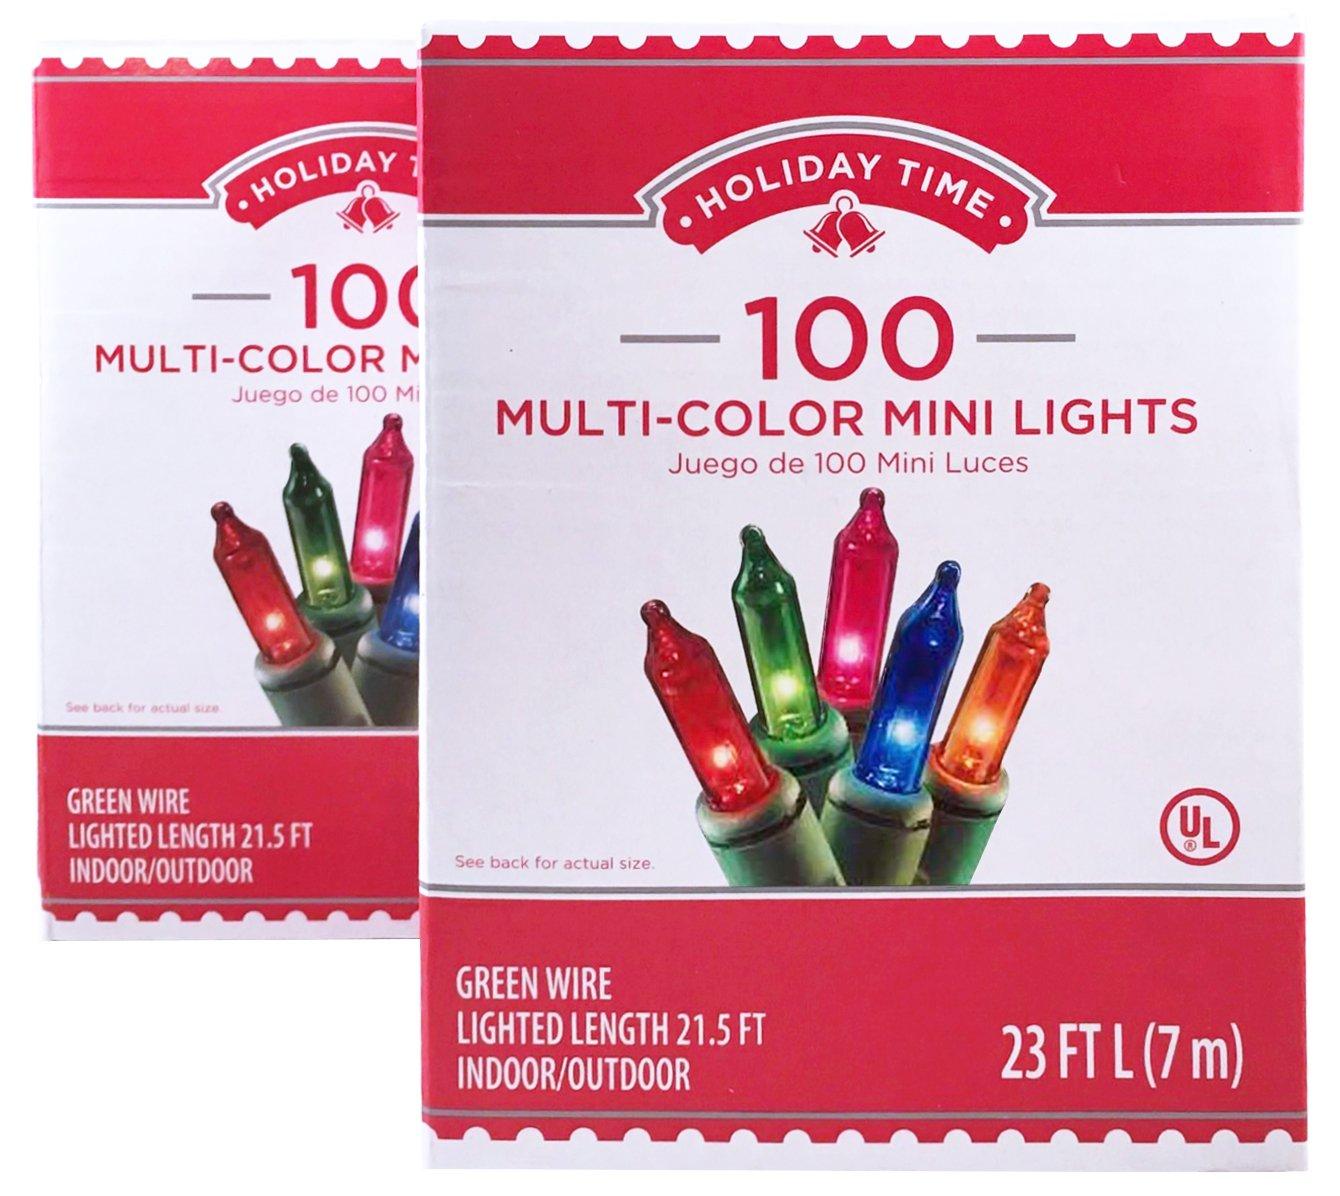 Amazon.com : Holiday Time 100 Multi-Color Mini Lights - Green Wire ...